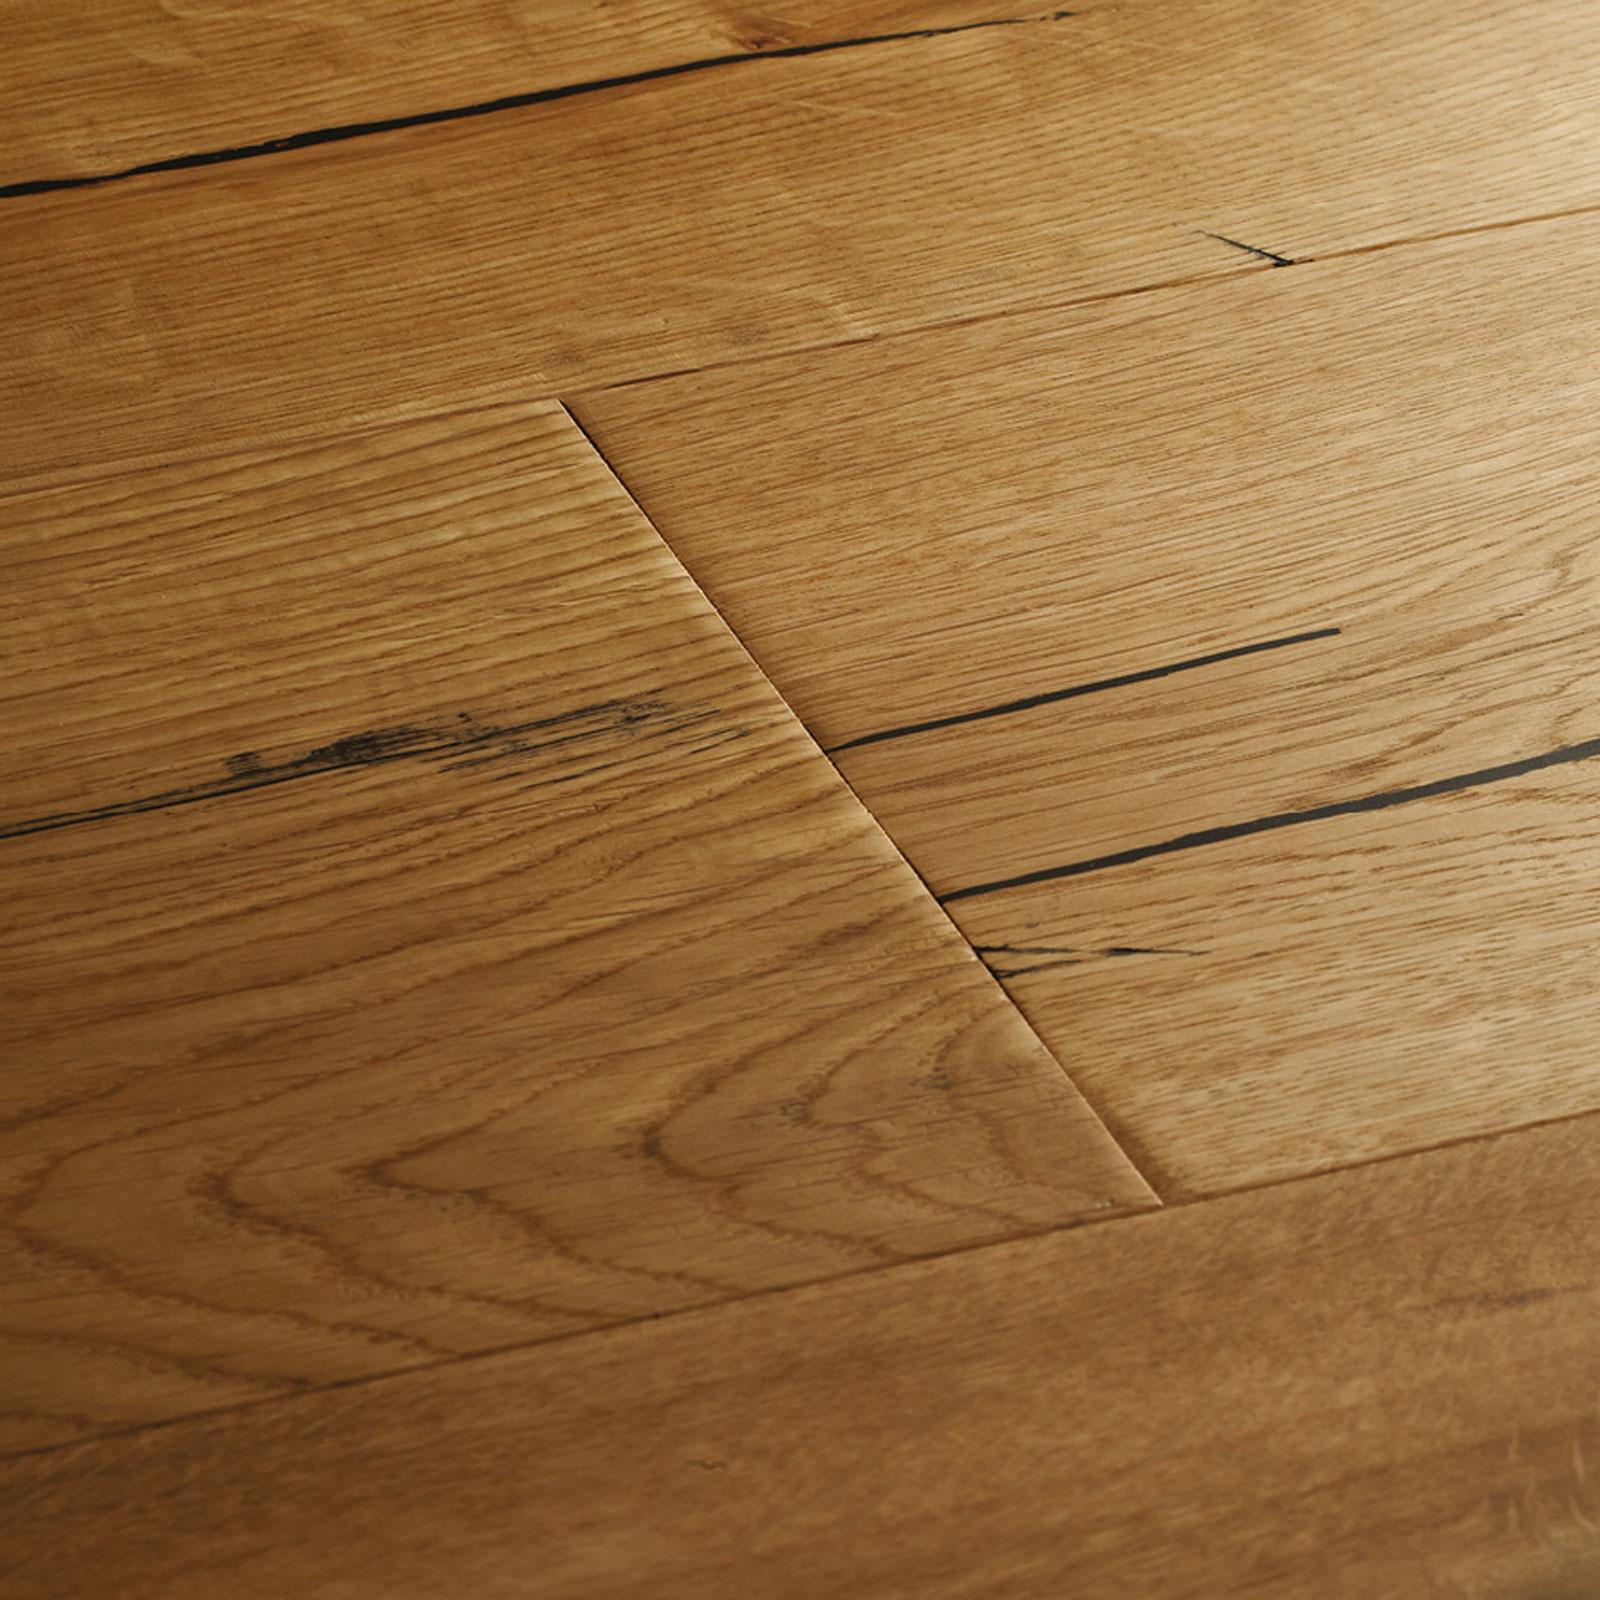 engineered wood flooring in yellow tones. Berkeley natural